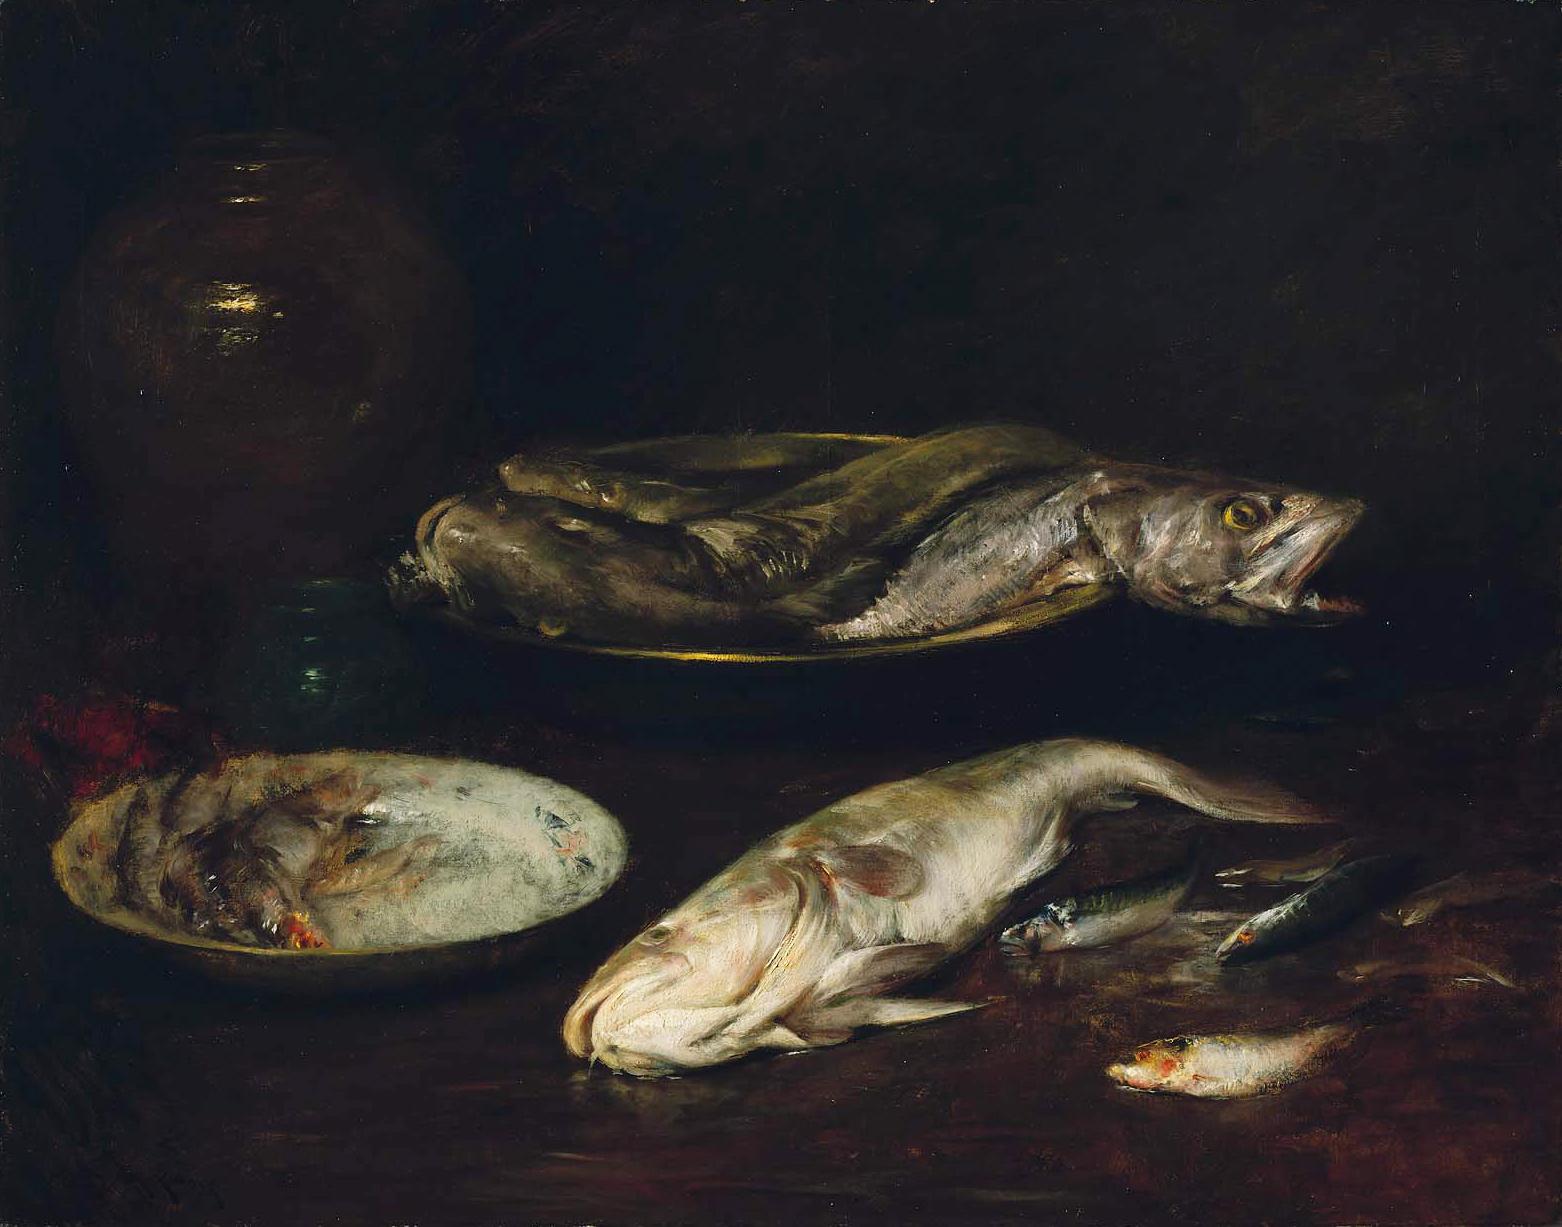 Уильям Чейз William Chase художник рыба натюрморт Альберт Сафиуллин американский импрессионизм